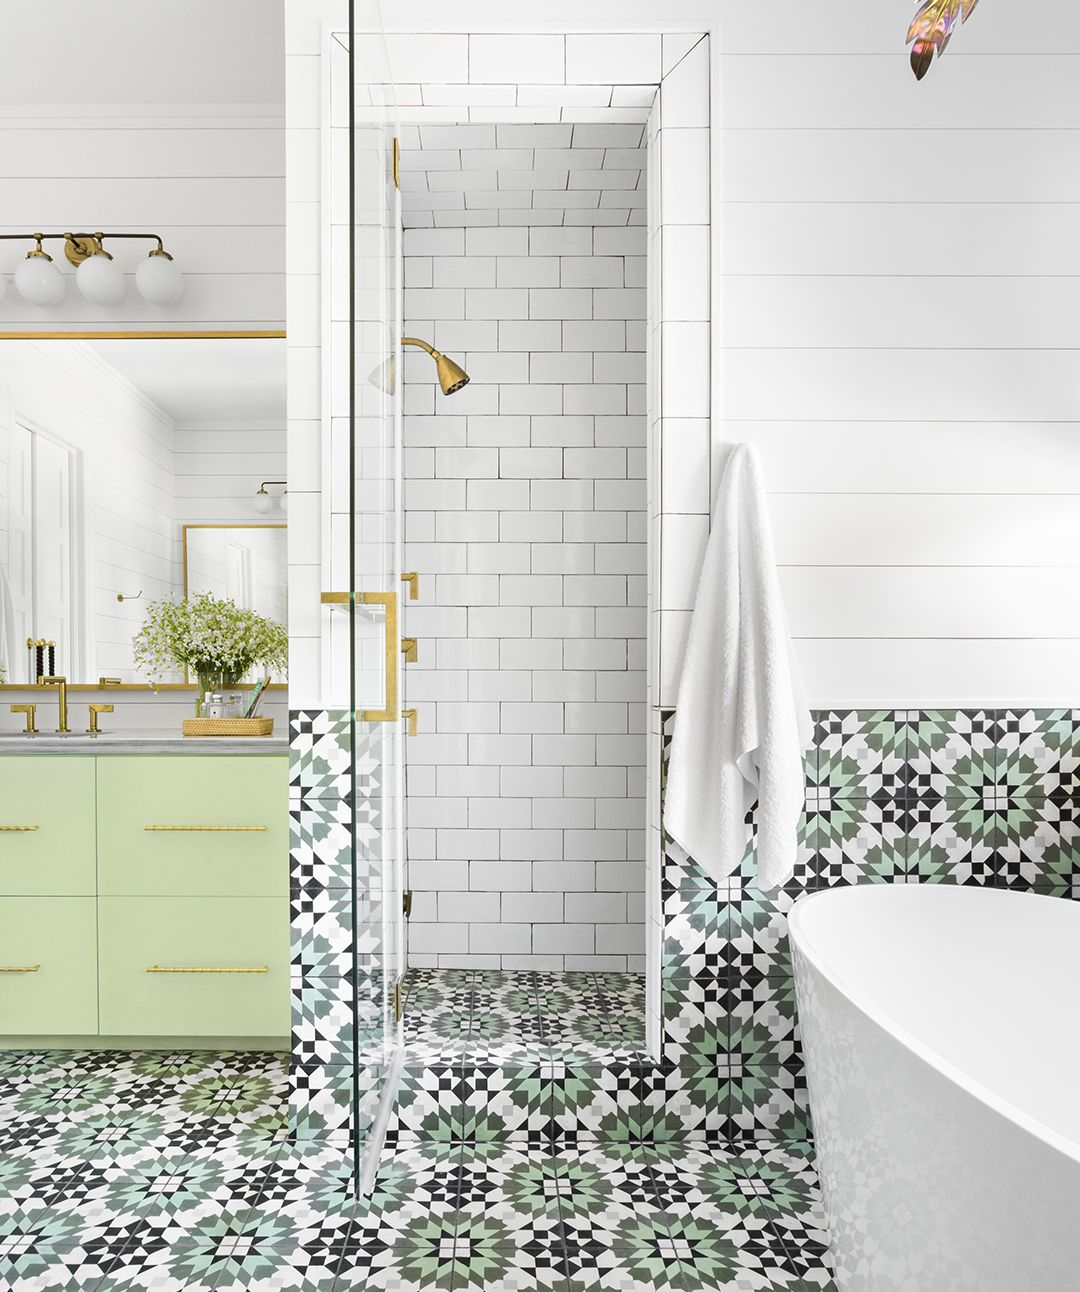 14 How To Tile A Bathroom Floor With Plank Tiles Bathroom Tiles Images Amazing Bathrooms Bathroom Flooring